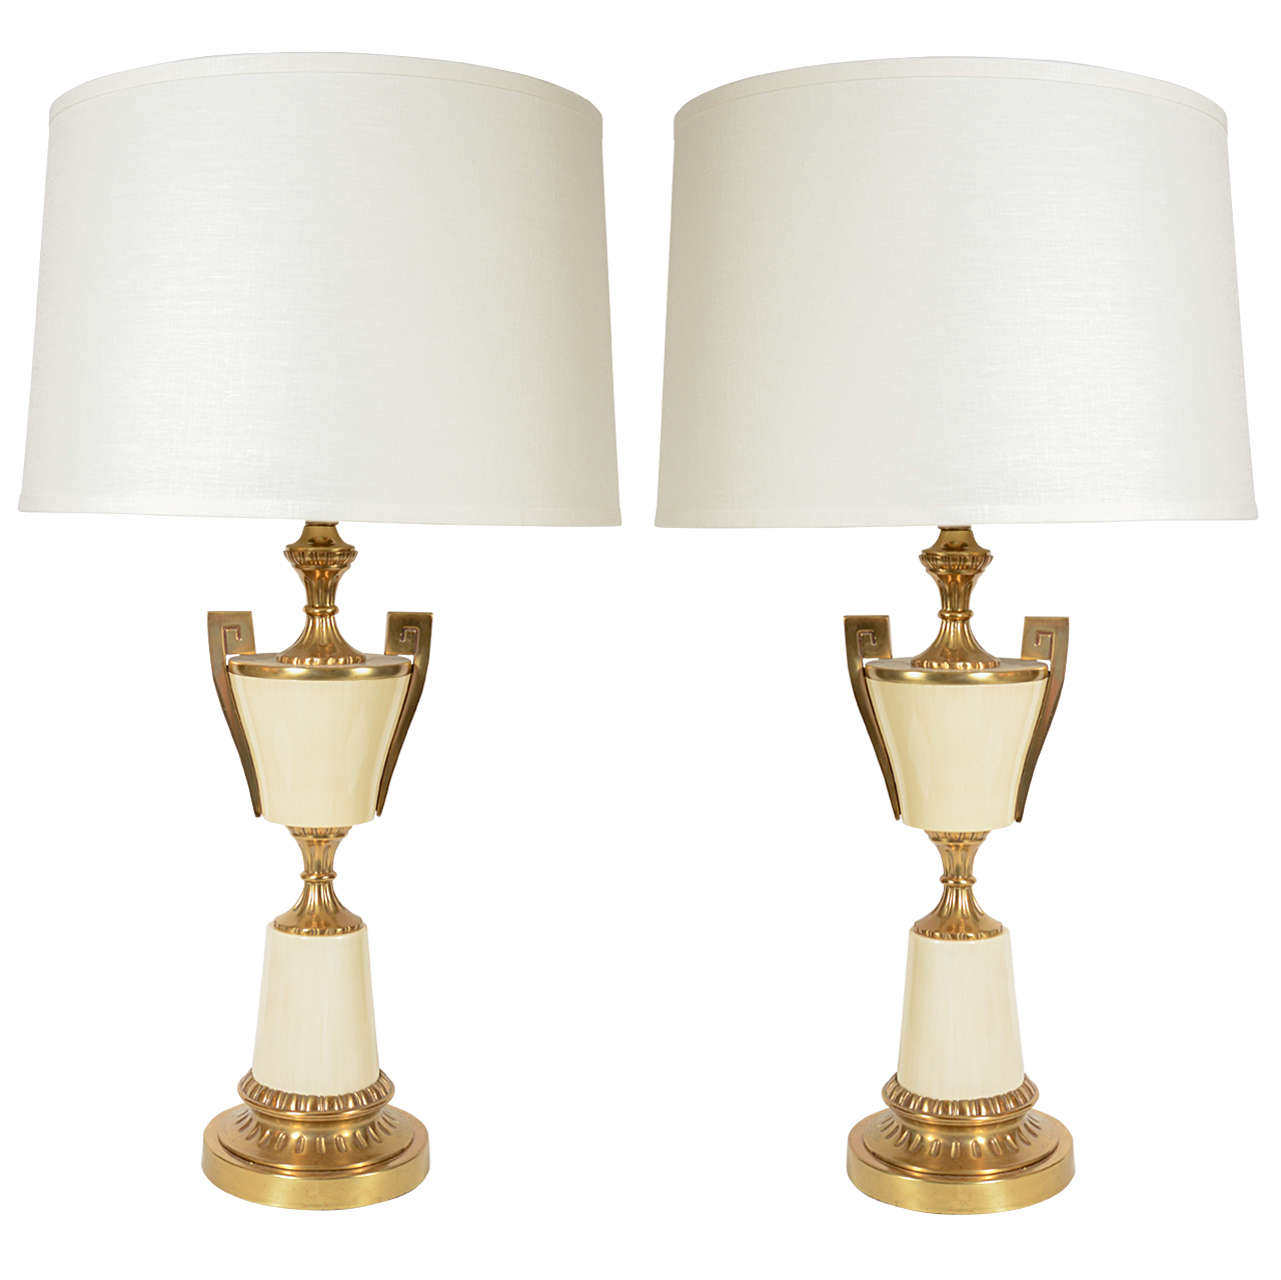 Pair of Impressive  Modernist Urn and Greek Key Lamps